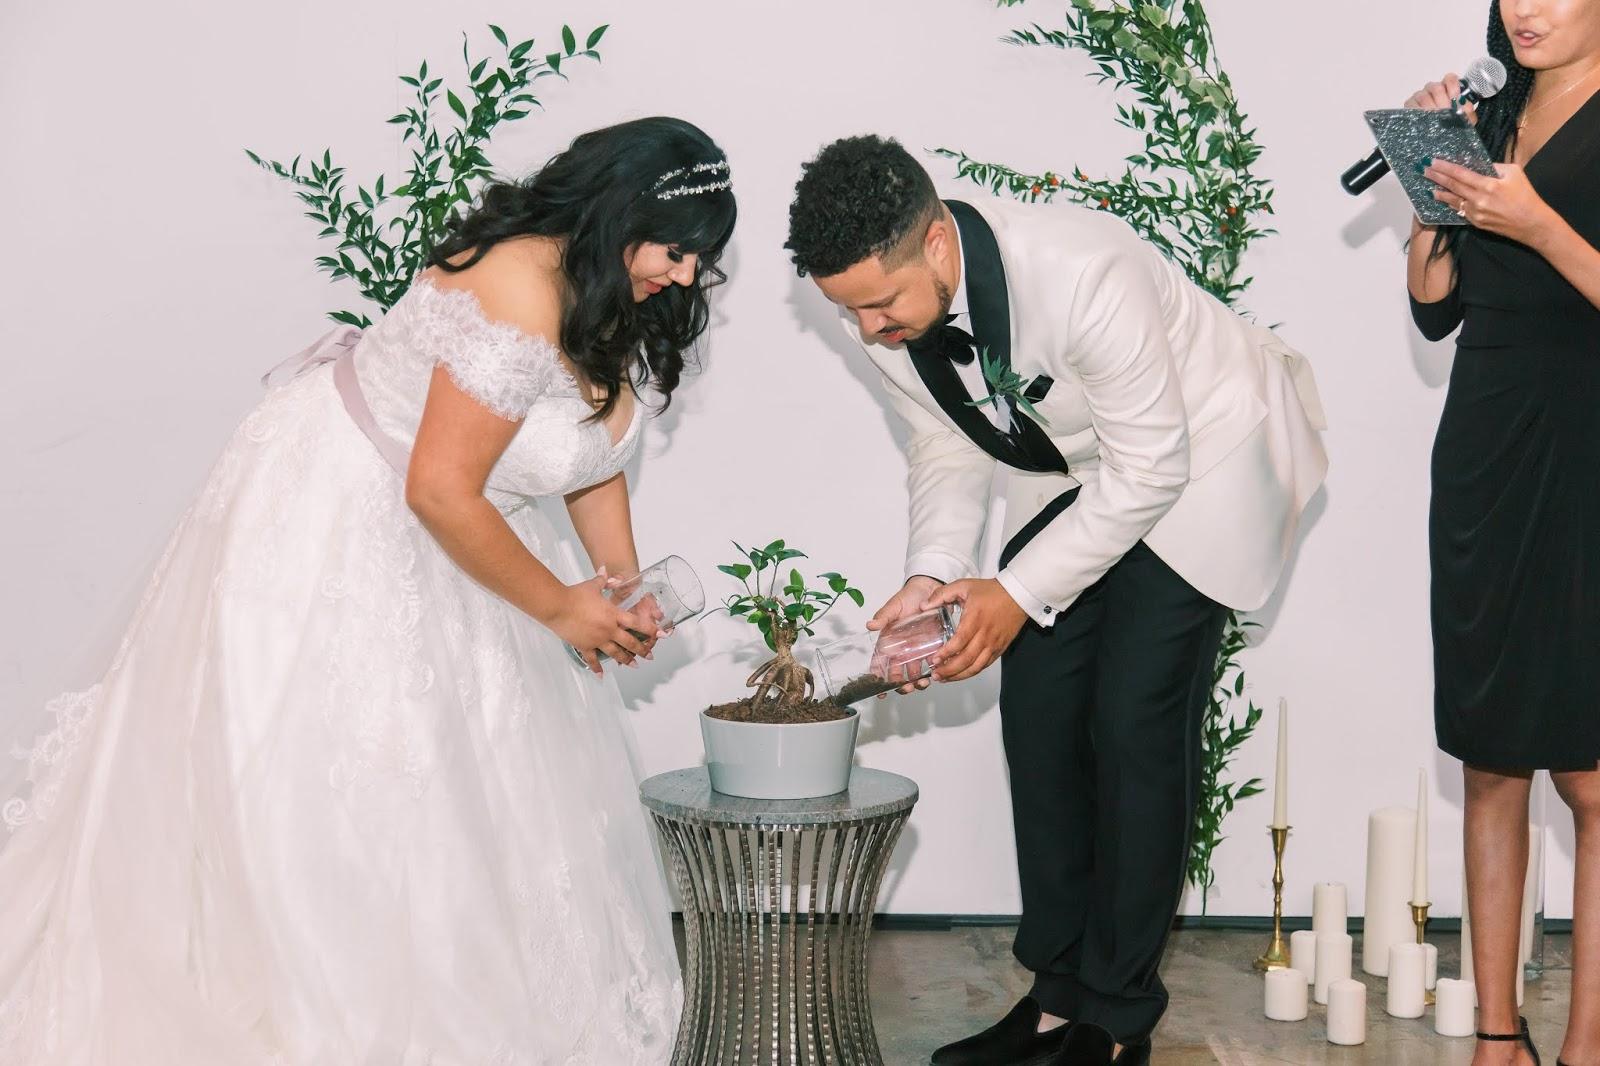 las vegas wedding, african american officiant, tree planting